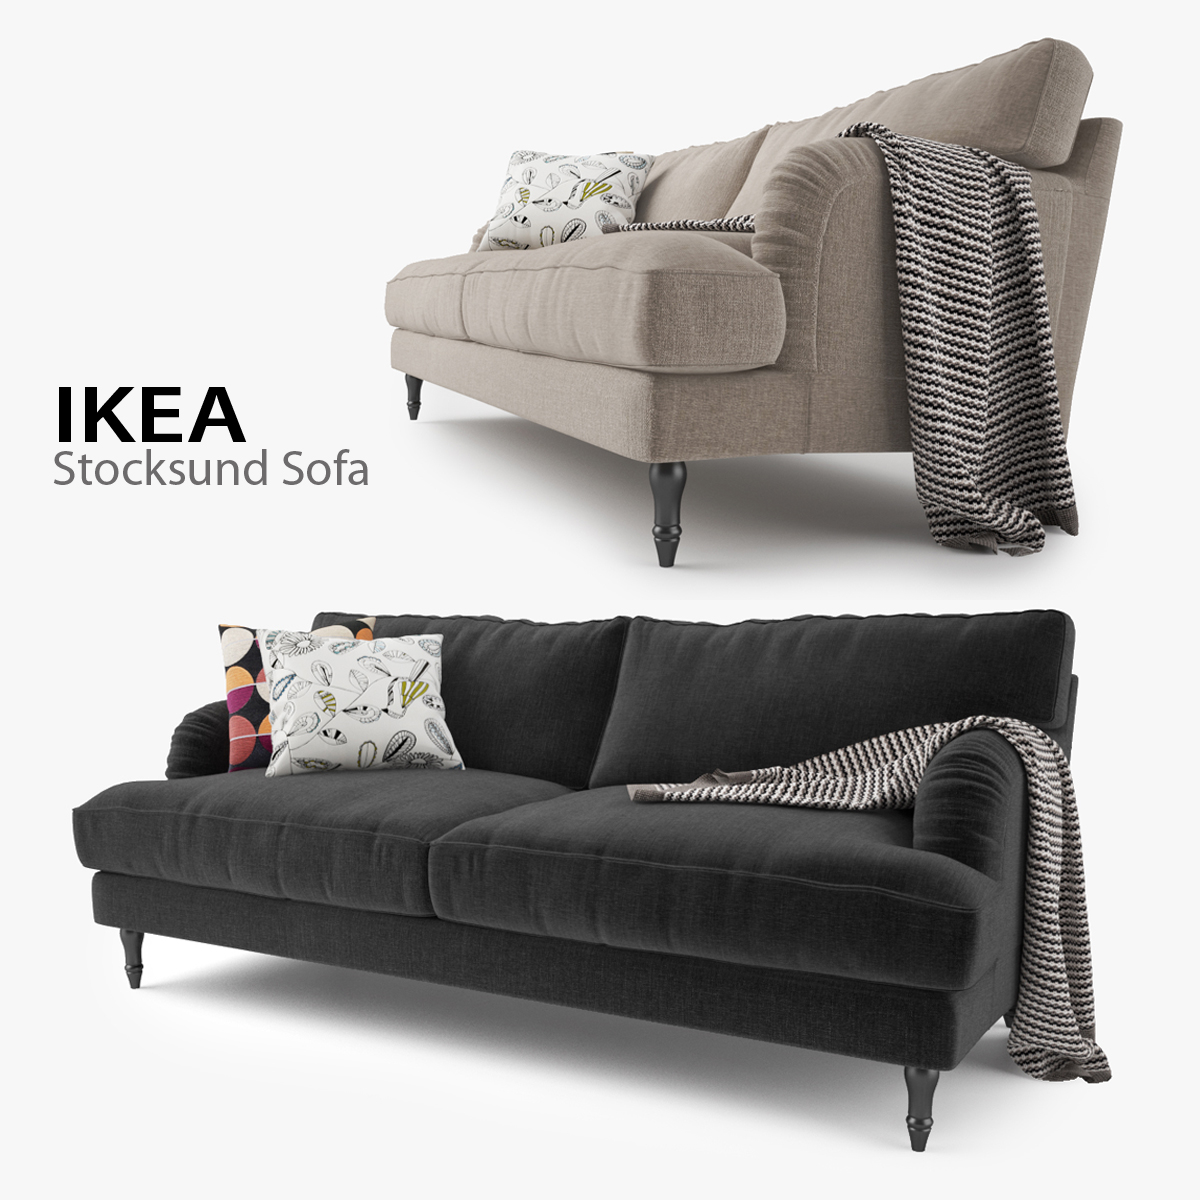 Ideas About Stocksund Sofa For Sale Onthecornerstone